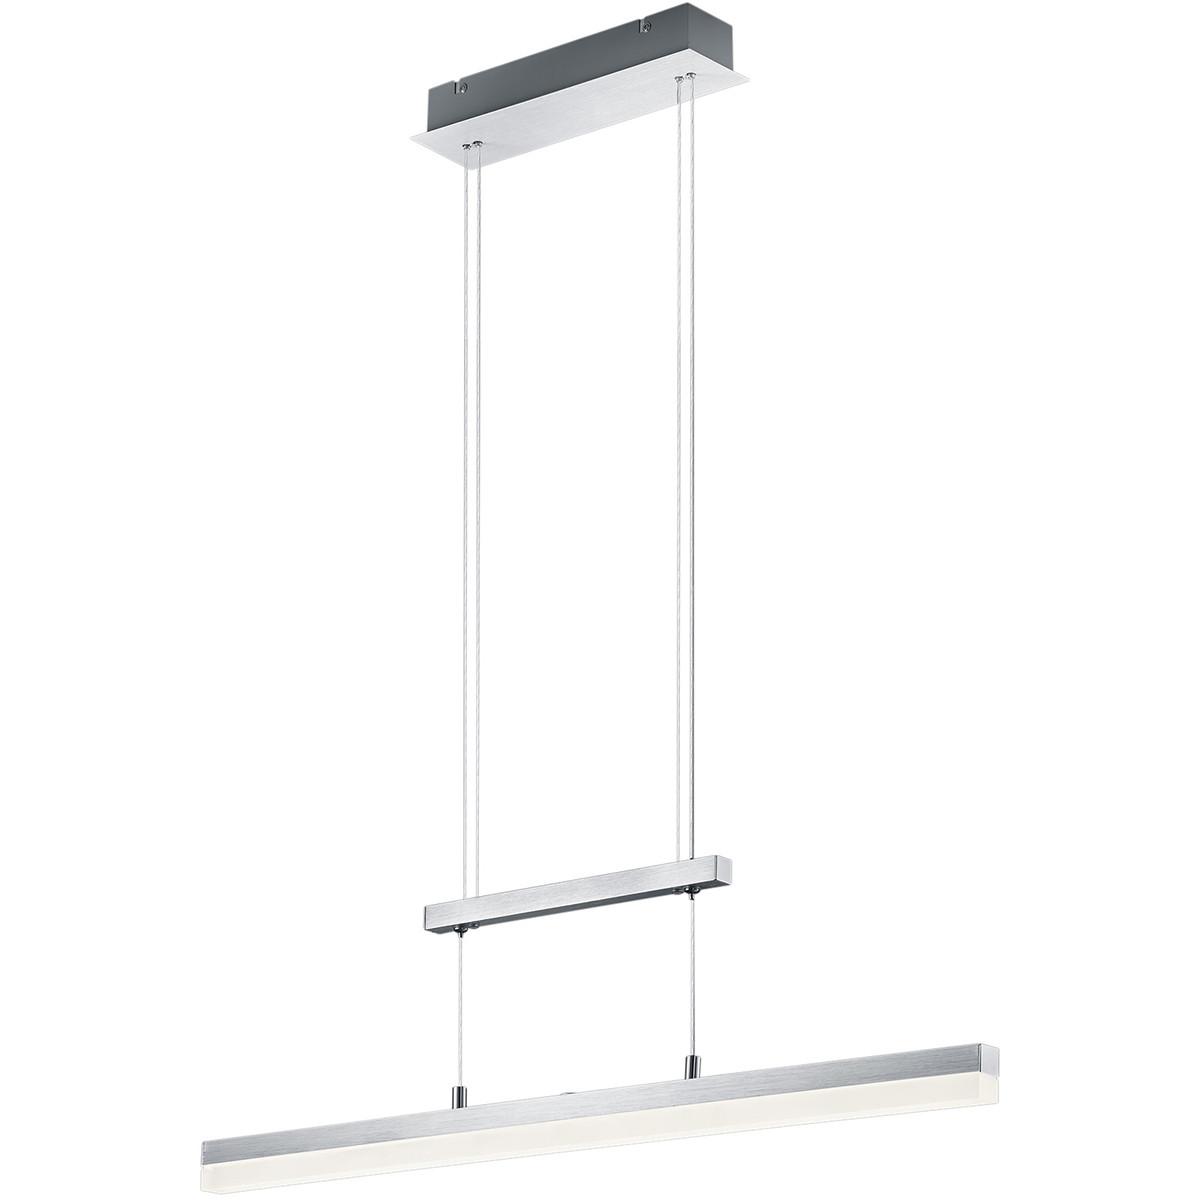 LED Hanglamp - Trion Kalvira - 20W - Warm Wit 3000K - Dimbaar - Rechthoek - Mat Chroom - Aluminium